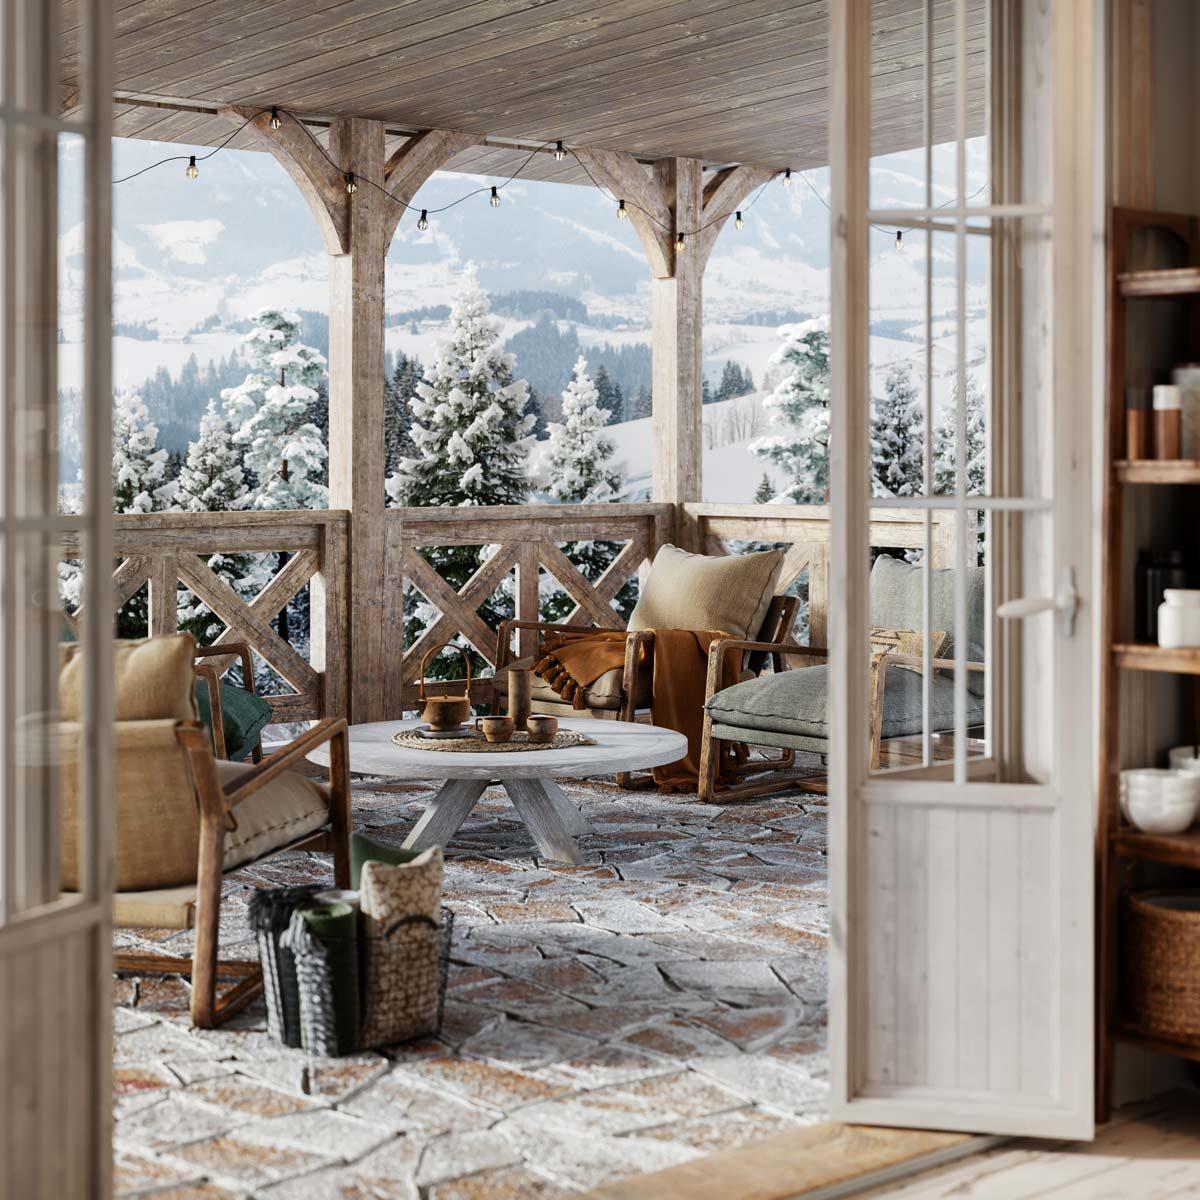 cozy balcony in snowy winter cottage